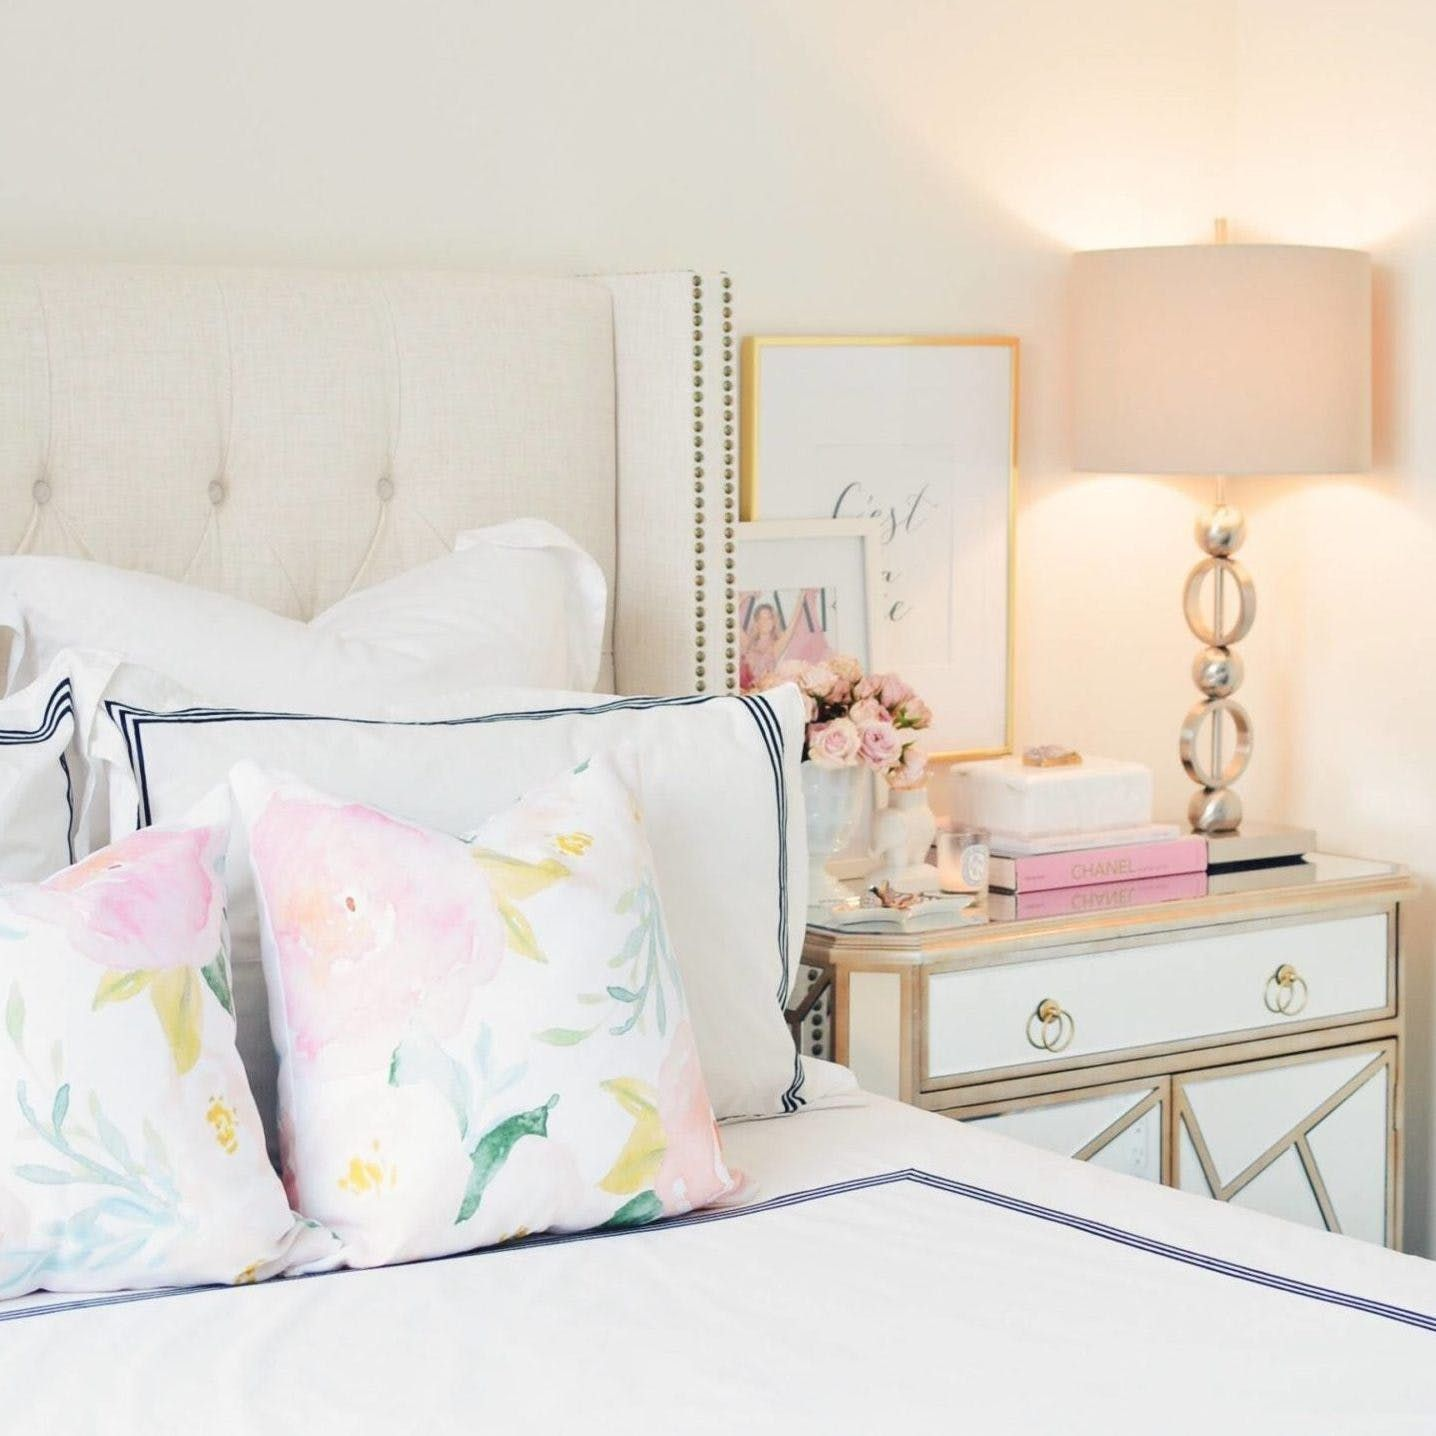 10 Kate Spade New York Inspired Bedrooms for the Preppy Girl in All